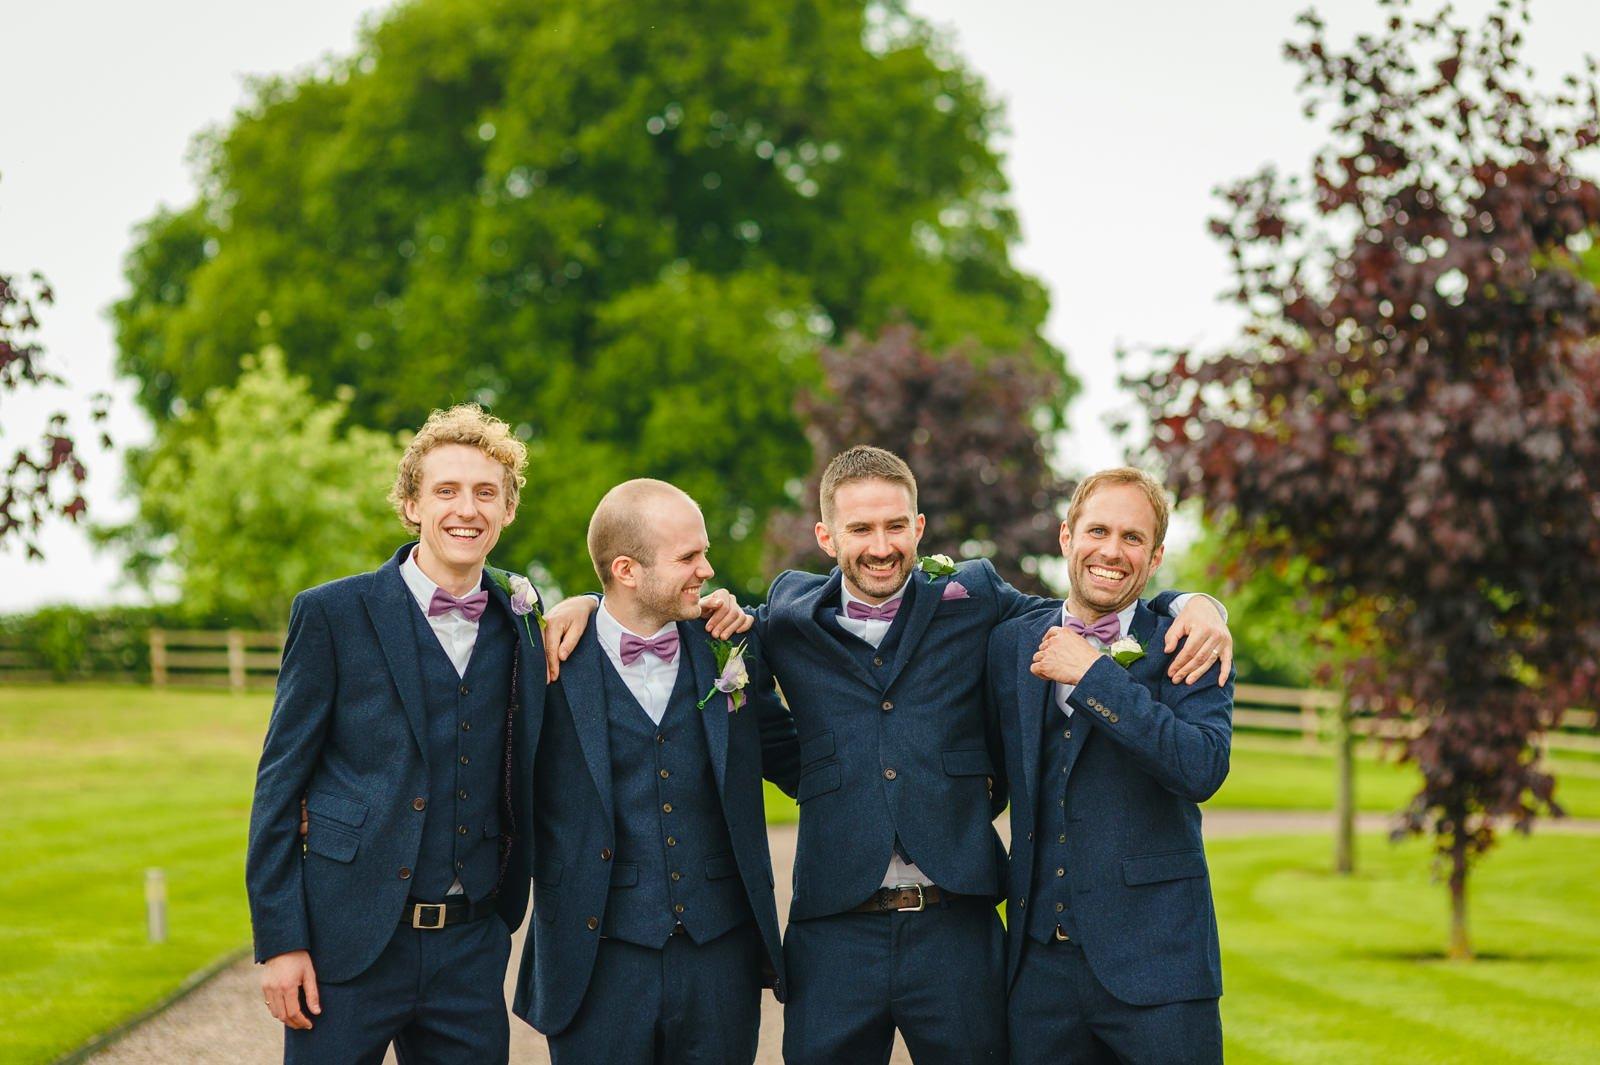 Millers Of Netley wedding, Dorrington, Shrewsbury | Emma + Ben 44